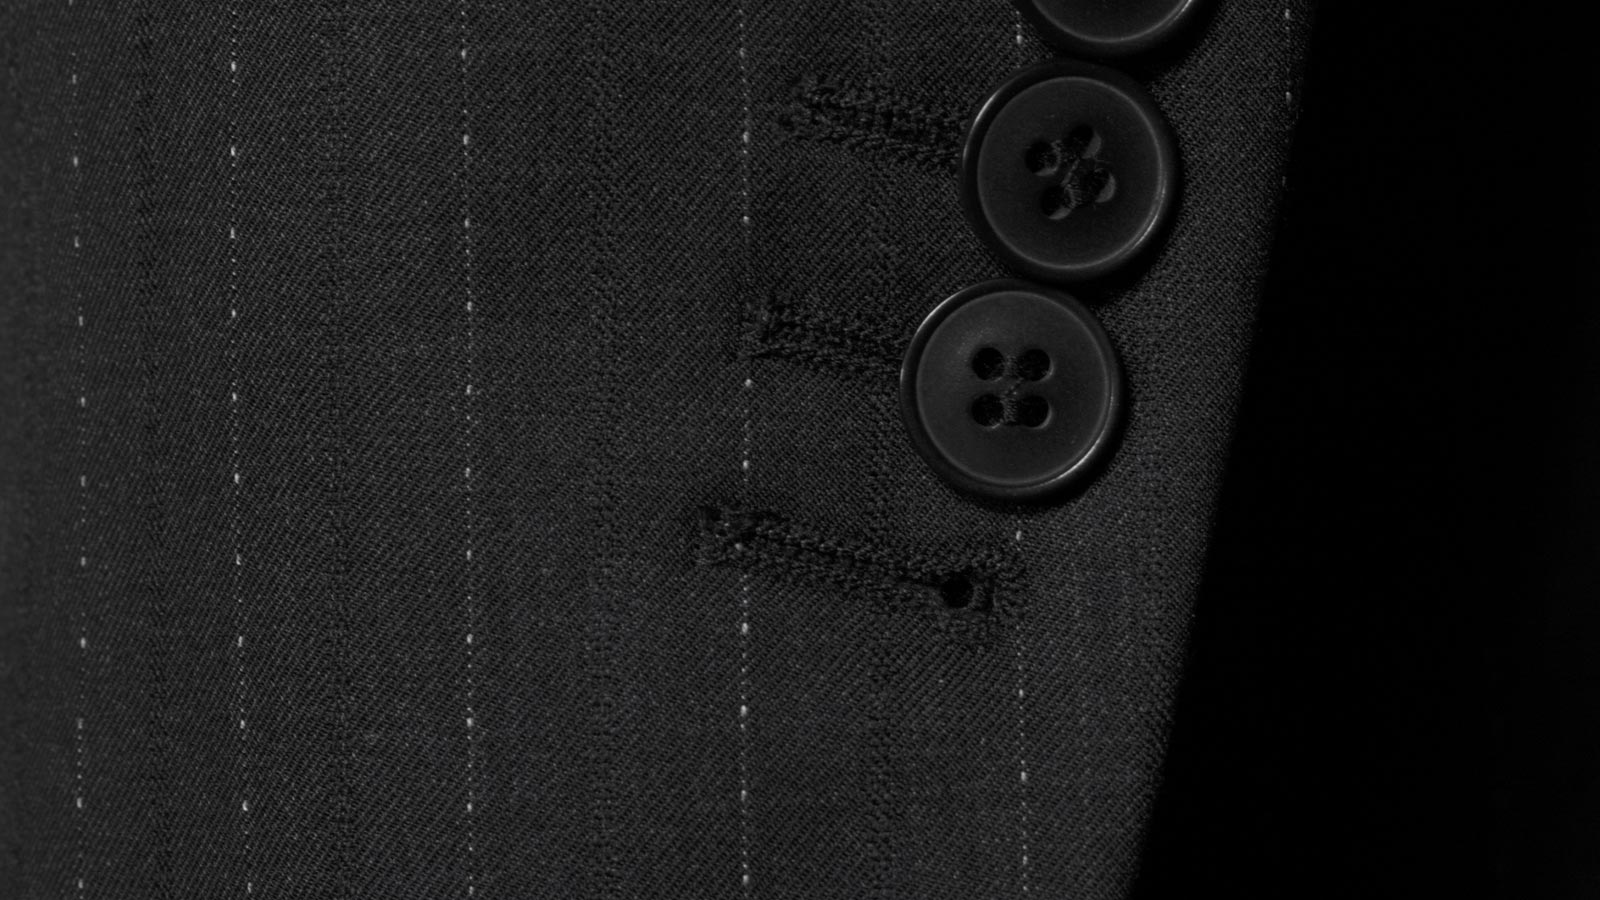 Sartorial Charcoal Pinstripe 160s Suit - slider image 1